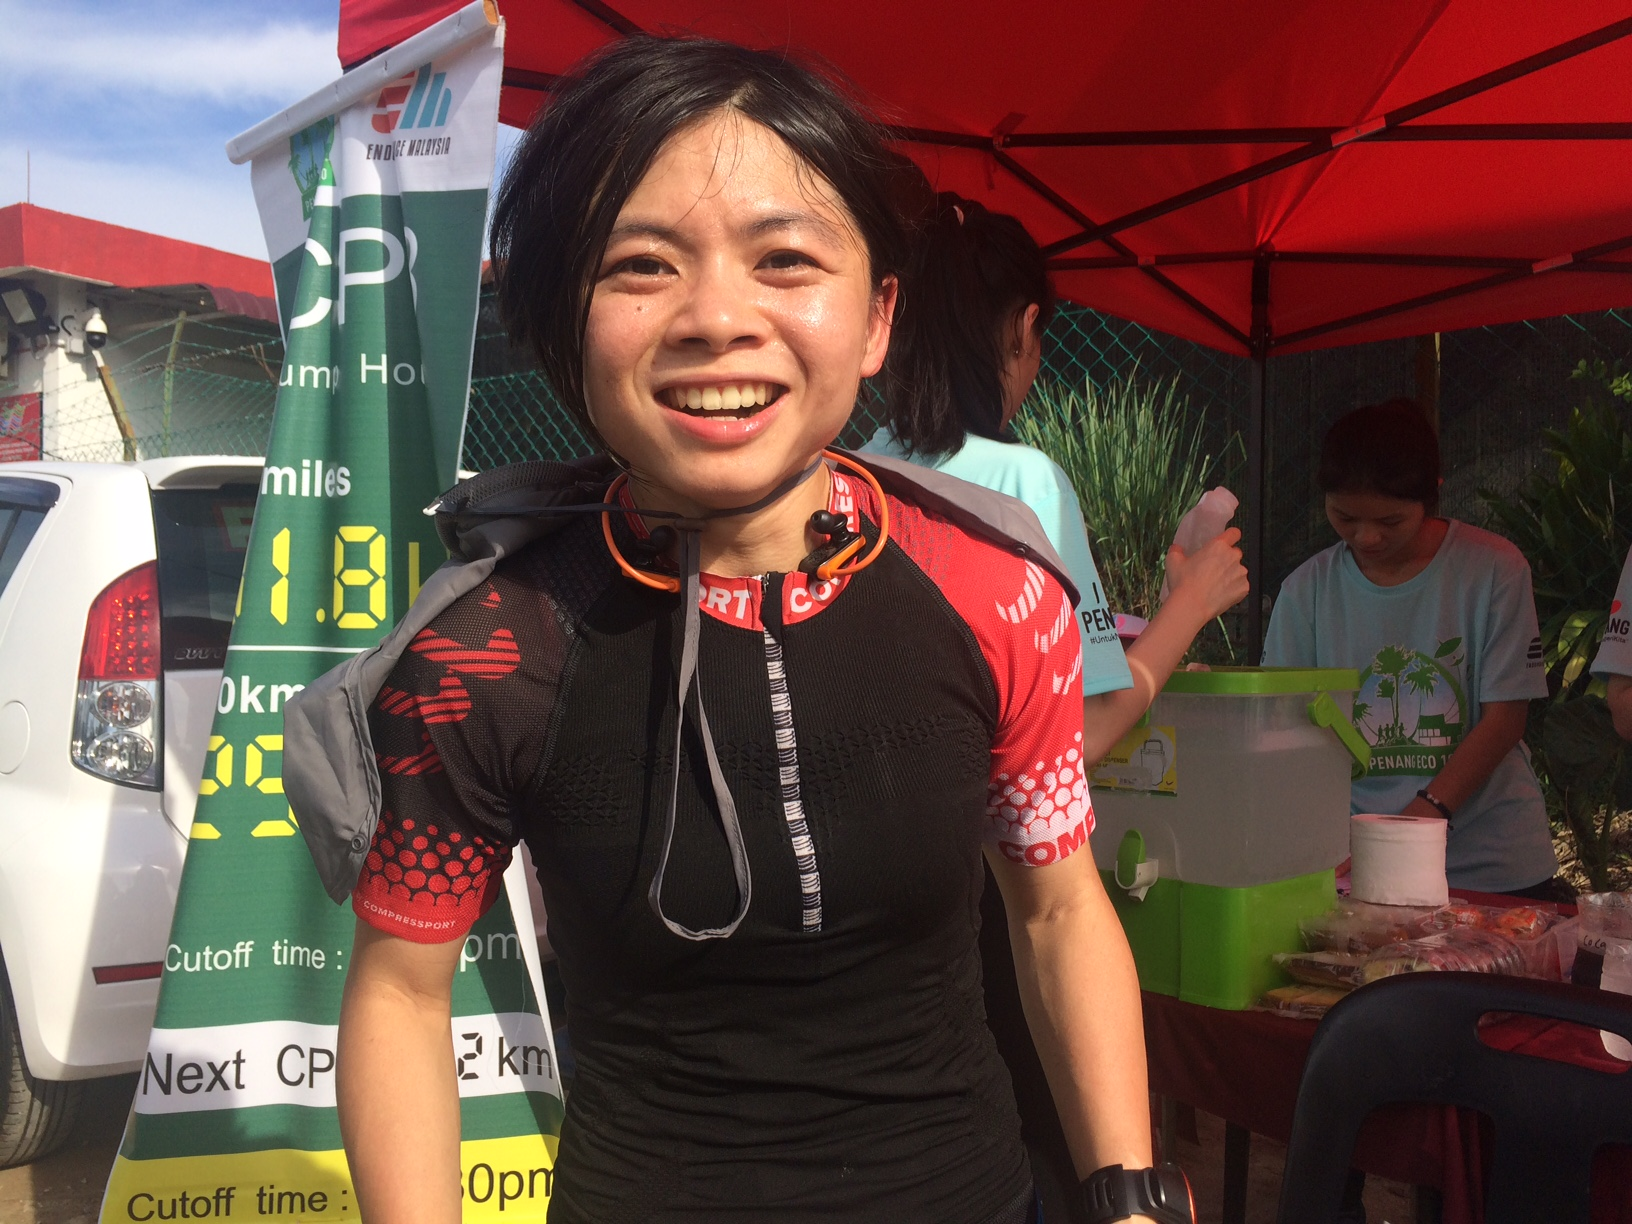 Christine Loh won the 100 miles for women!